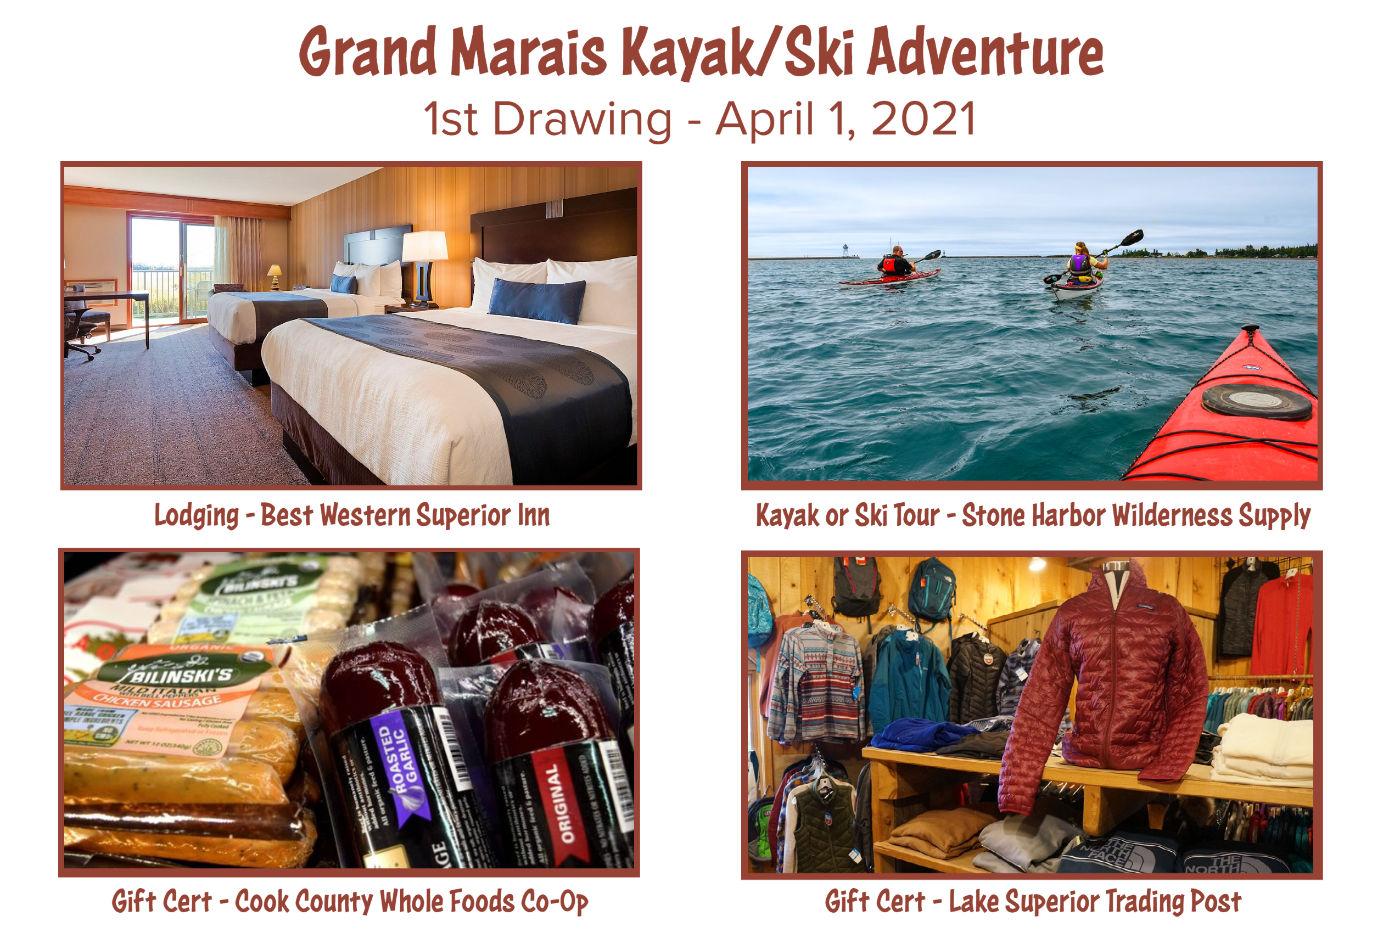 Grand Marais Kayak/Ski Adventure. 1st Drawing - April 1, 2021. Lodging - Best Western Superior Inn. Kayak or Ski Tour - Stone Harbor Wilderness Supply. Gift Cert - Cook County Whole Foods Co-Op. Gift Cert - Lake Superior Trading Post.